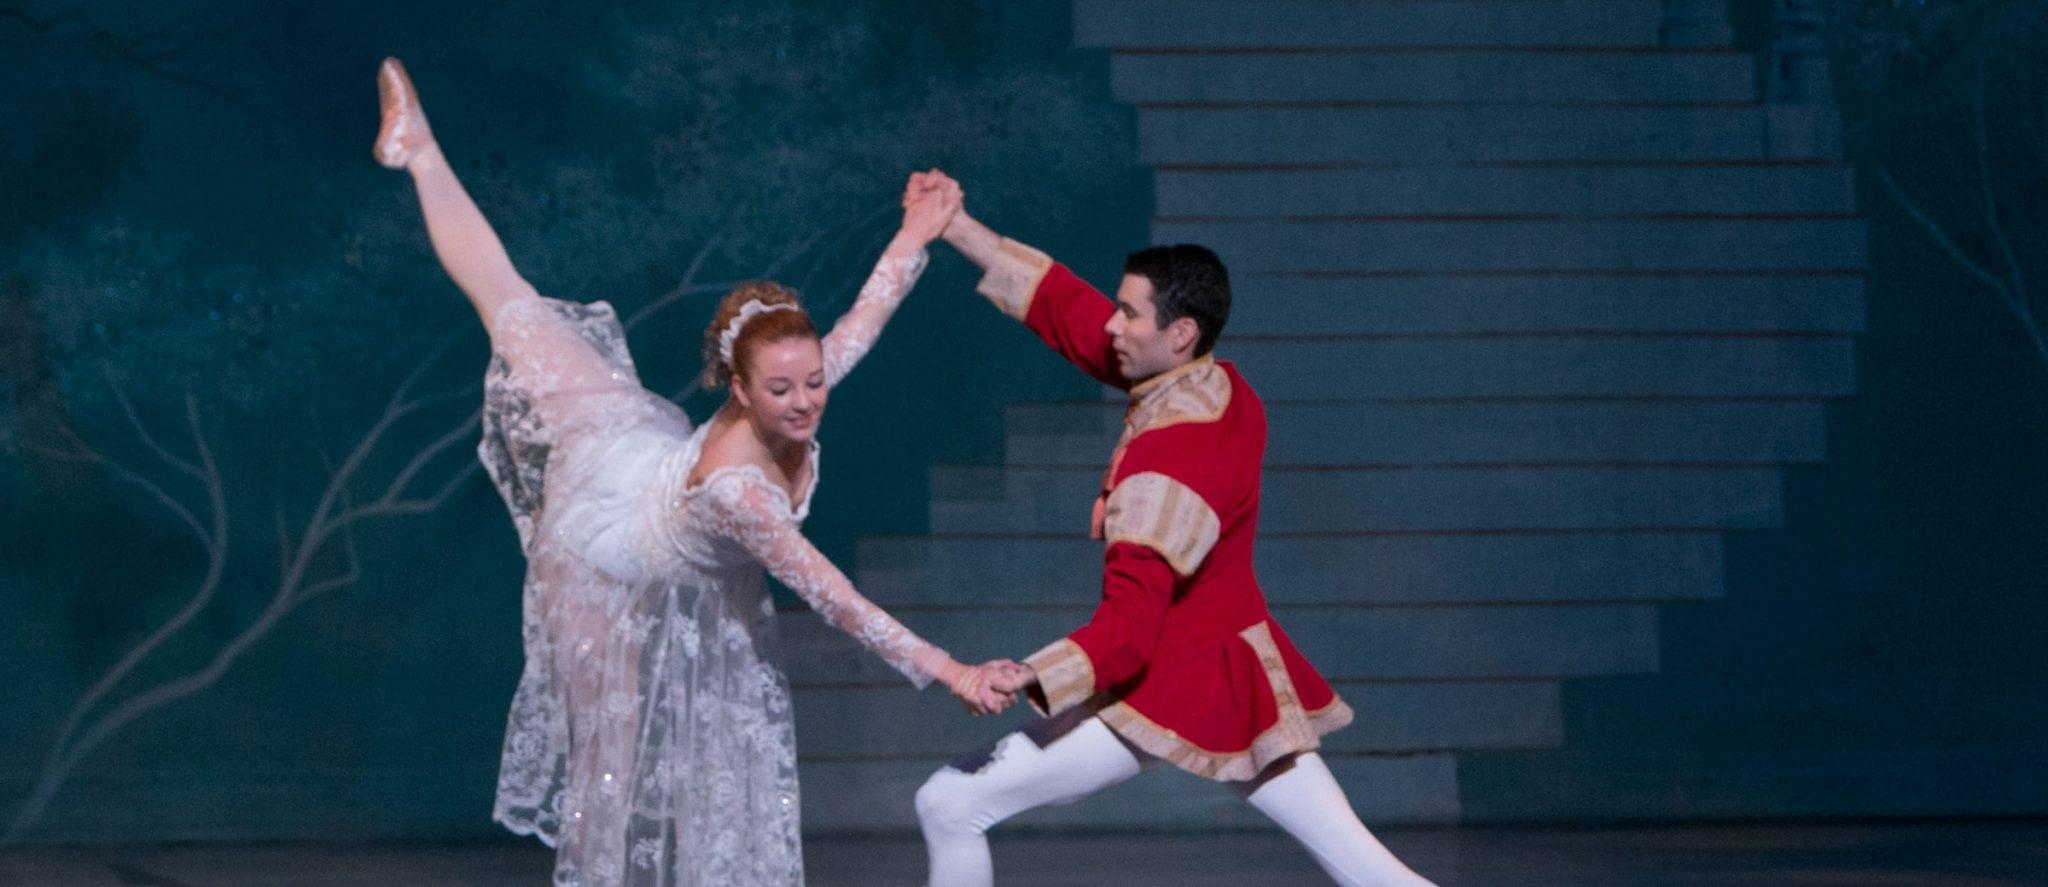 Conejo Civic Ballet presents The Nutcracker